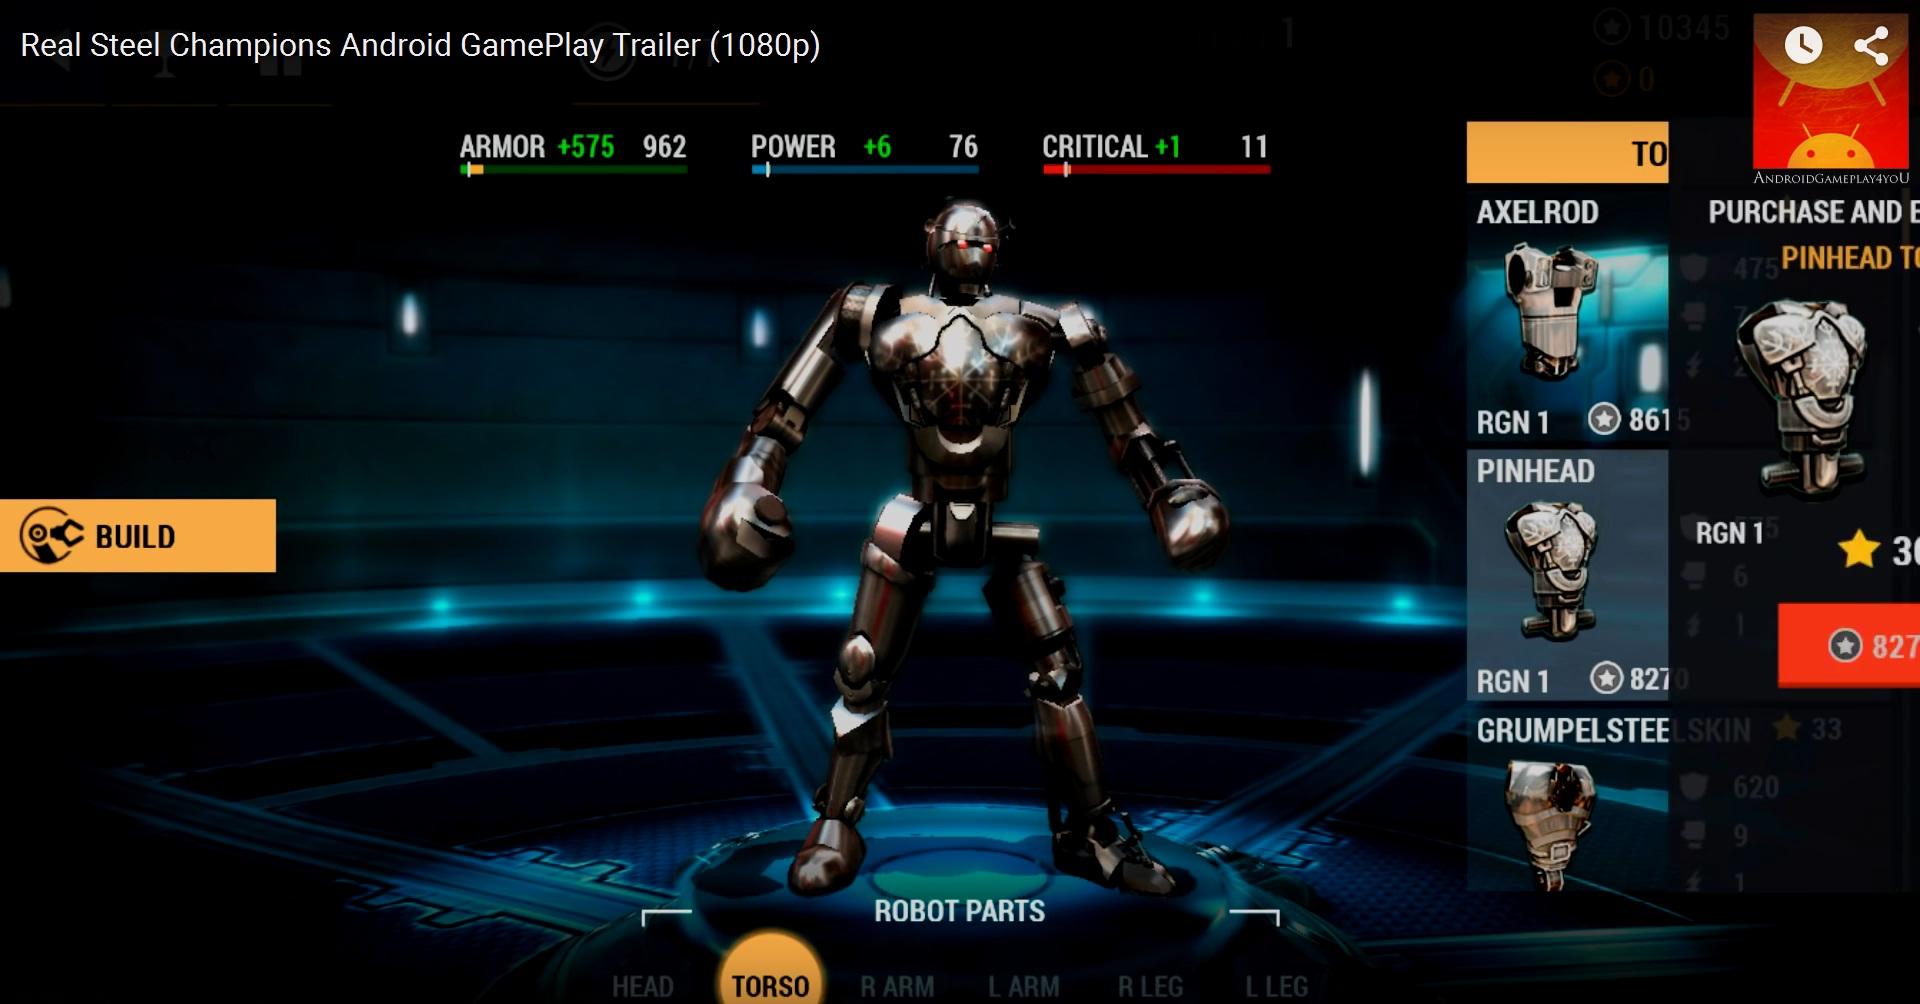 Real Steel World Robot Boxing v Мод (Много денег) » www.poegosledam.ru - Моды, игры, взломы, хаки, много, денег все на твой Android!